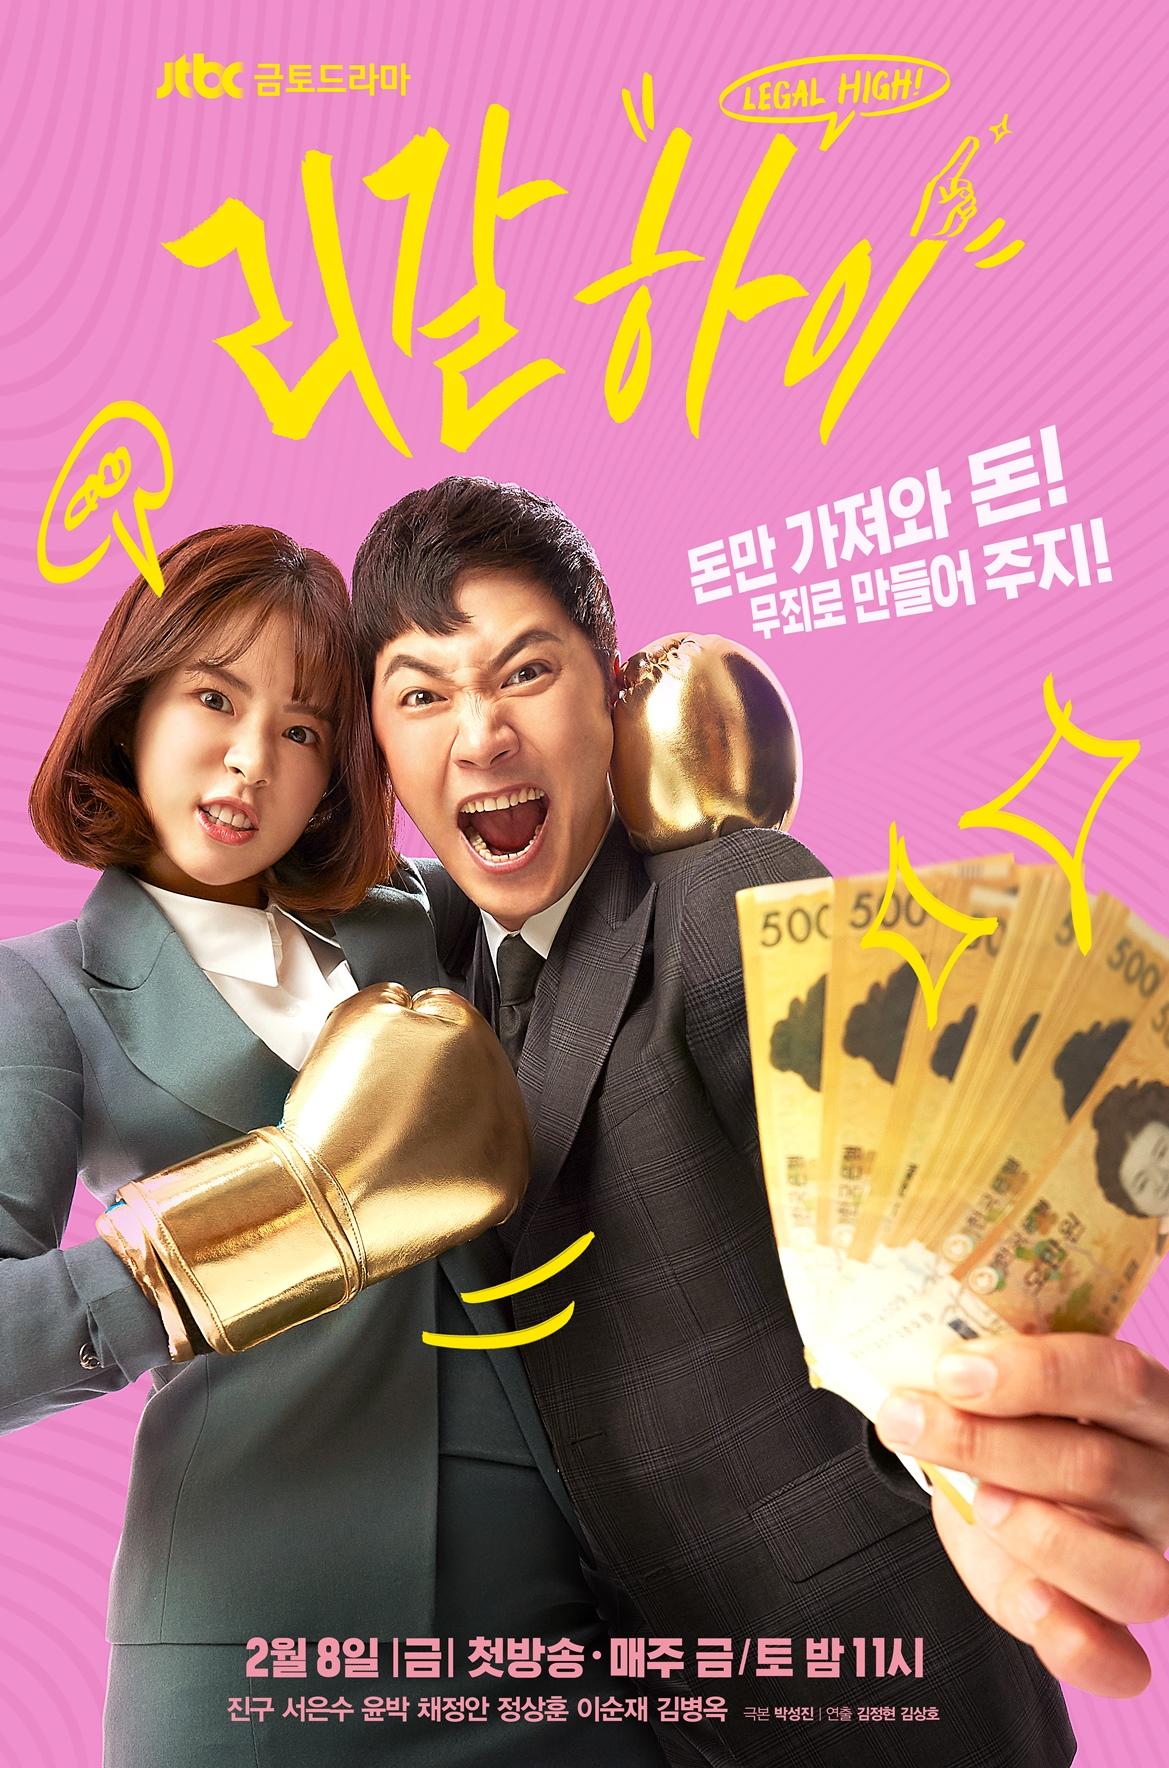 Legal High (jTBC)